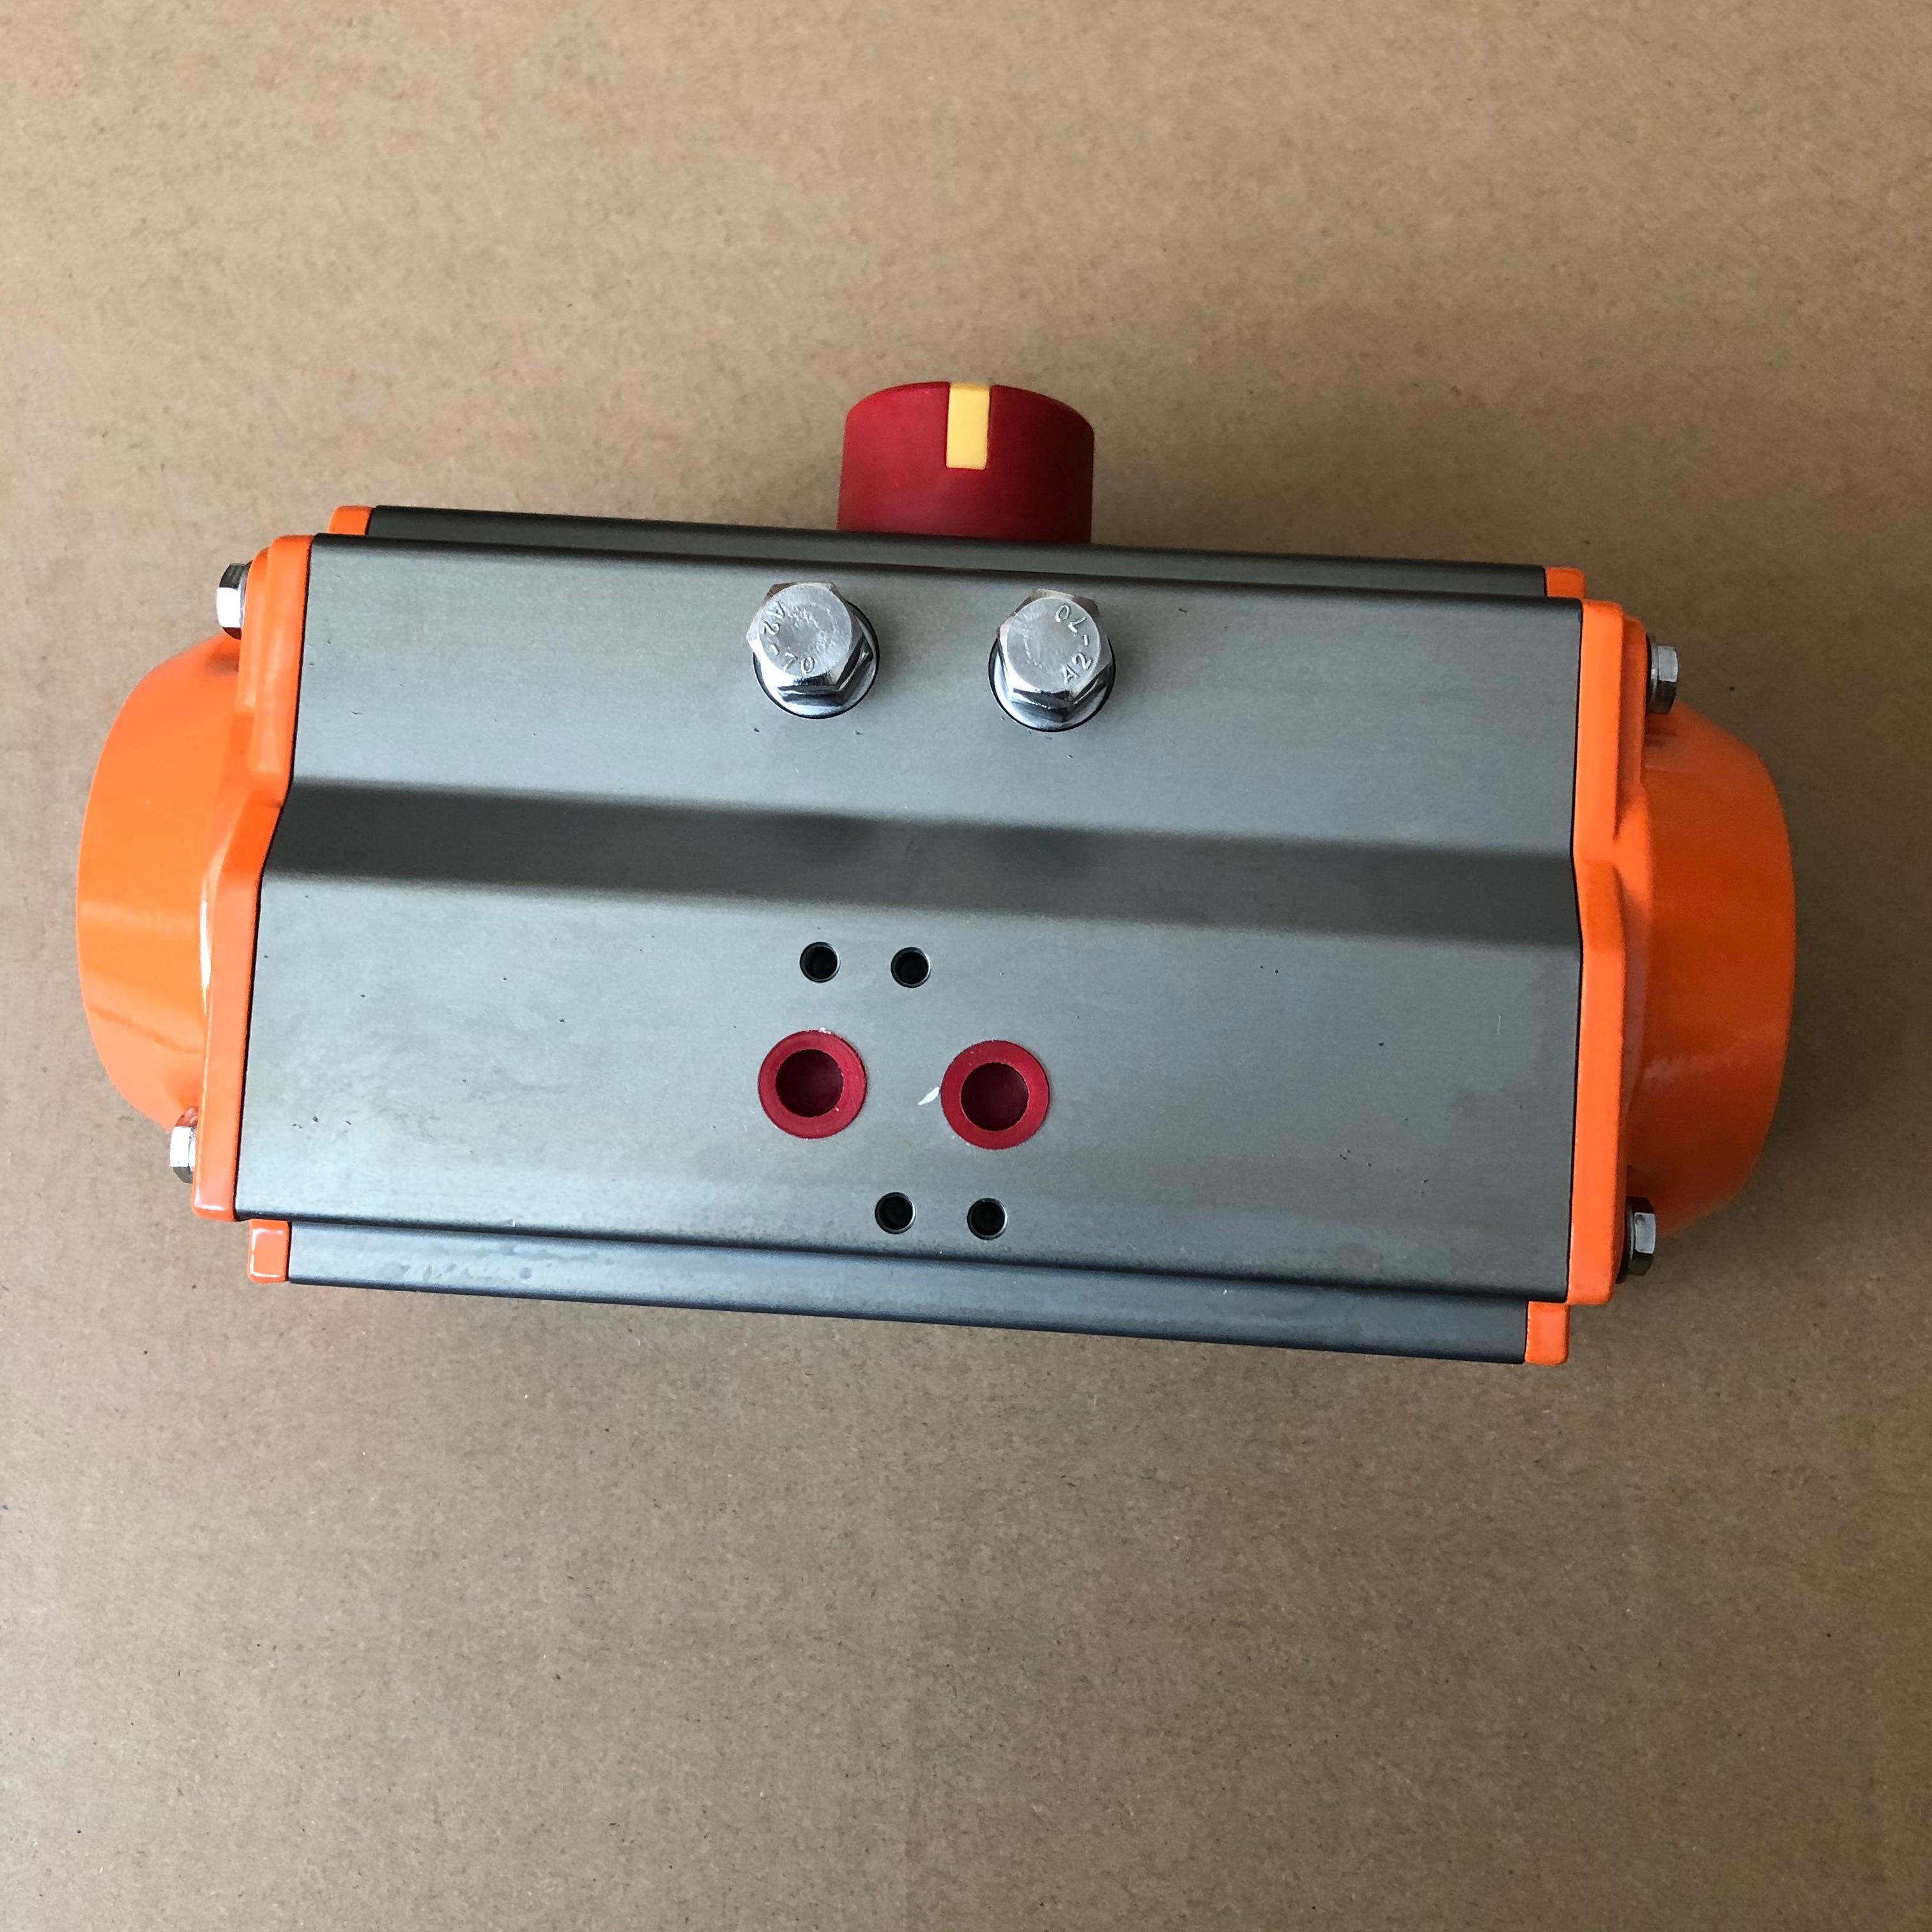 75 Mm Pneumatische Actuator Pneumatische Dubbelwerkend Bal Vlinder Klep